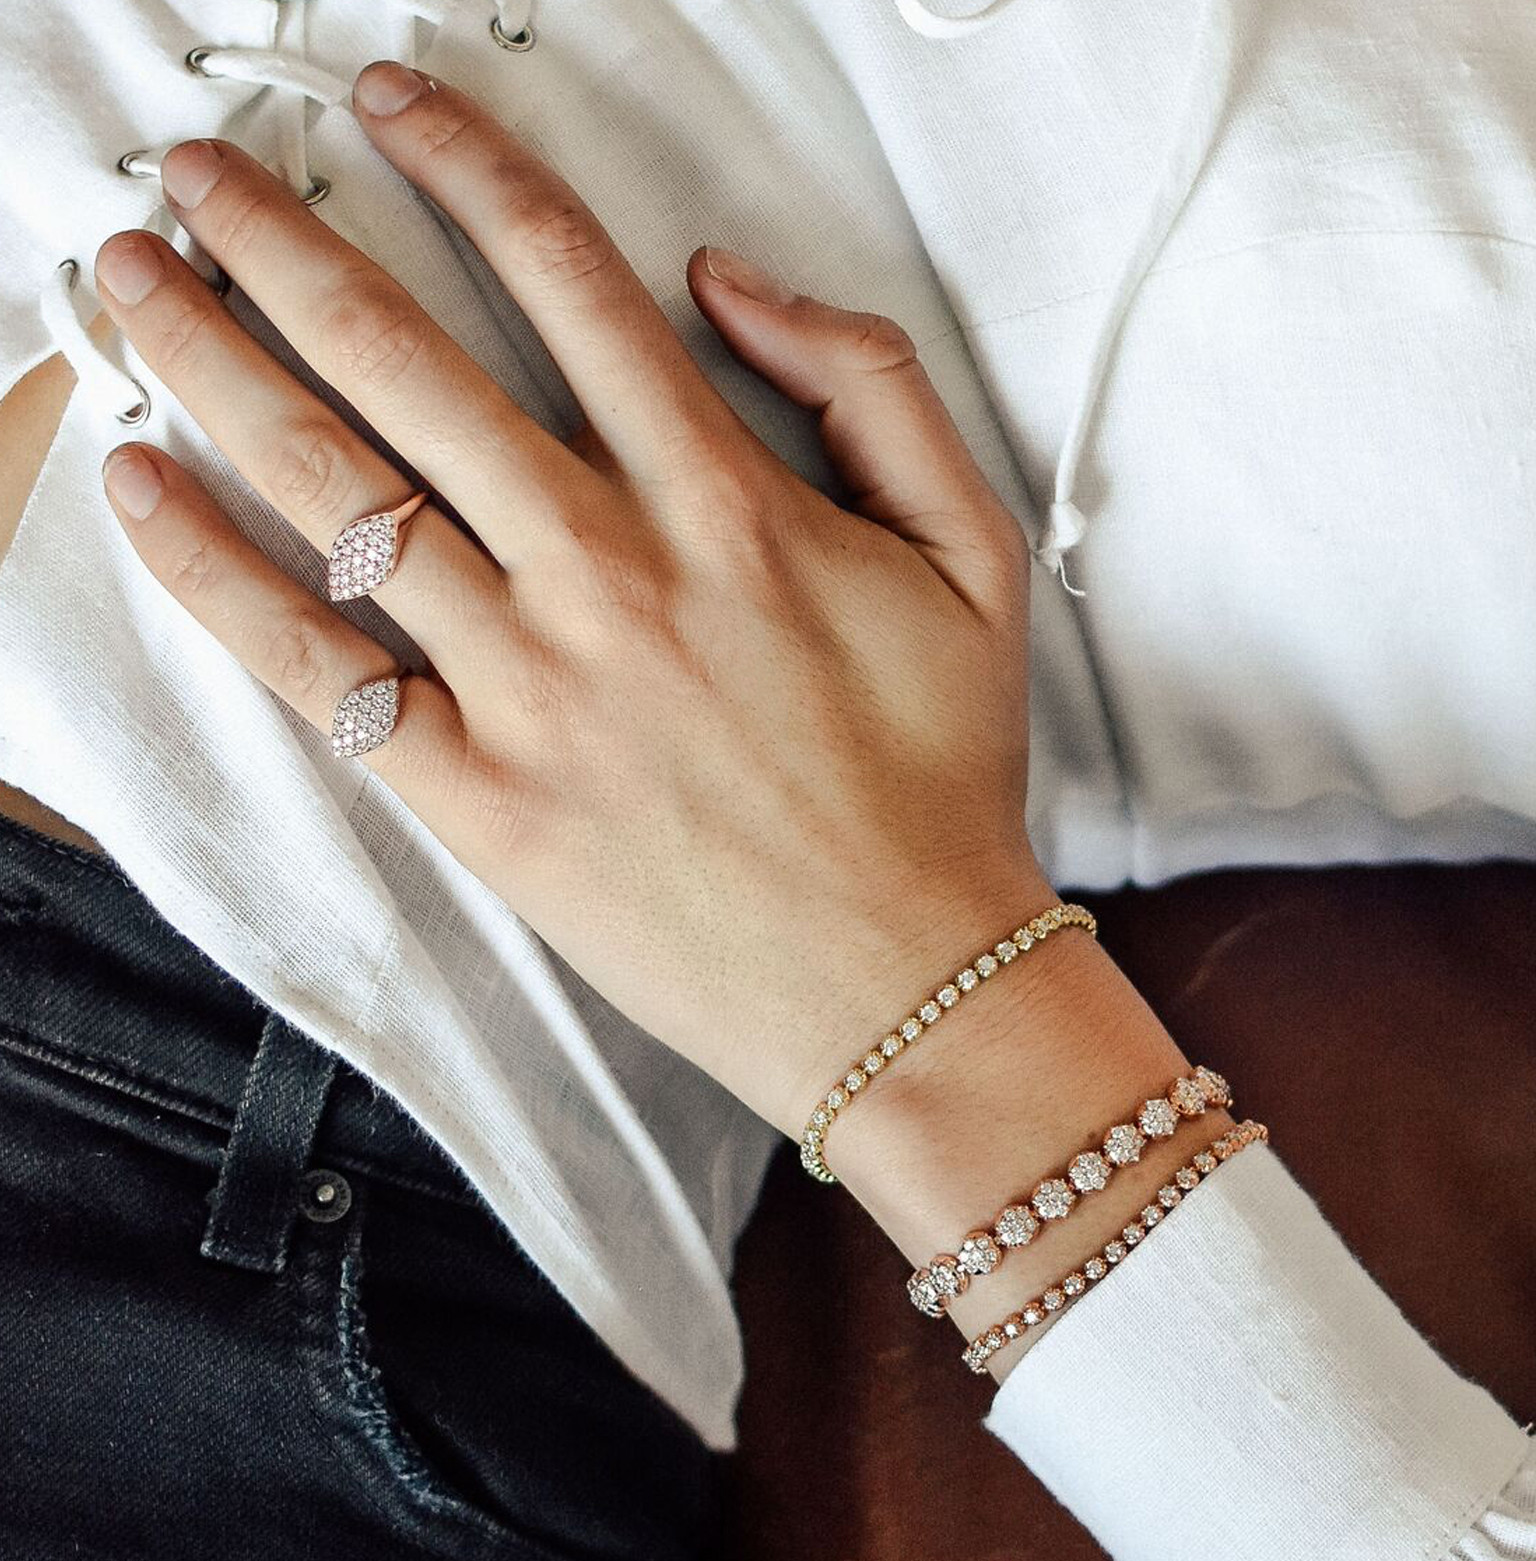 Carbon & Hyde Gemma Diamond Pinky Ring in 14K Gold on model